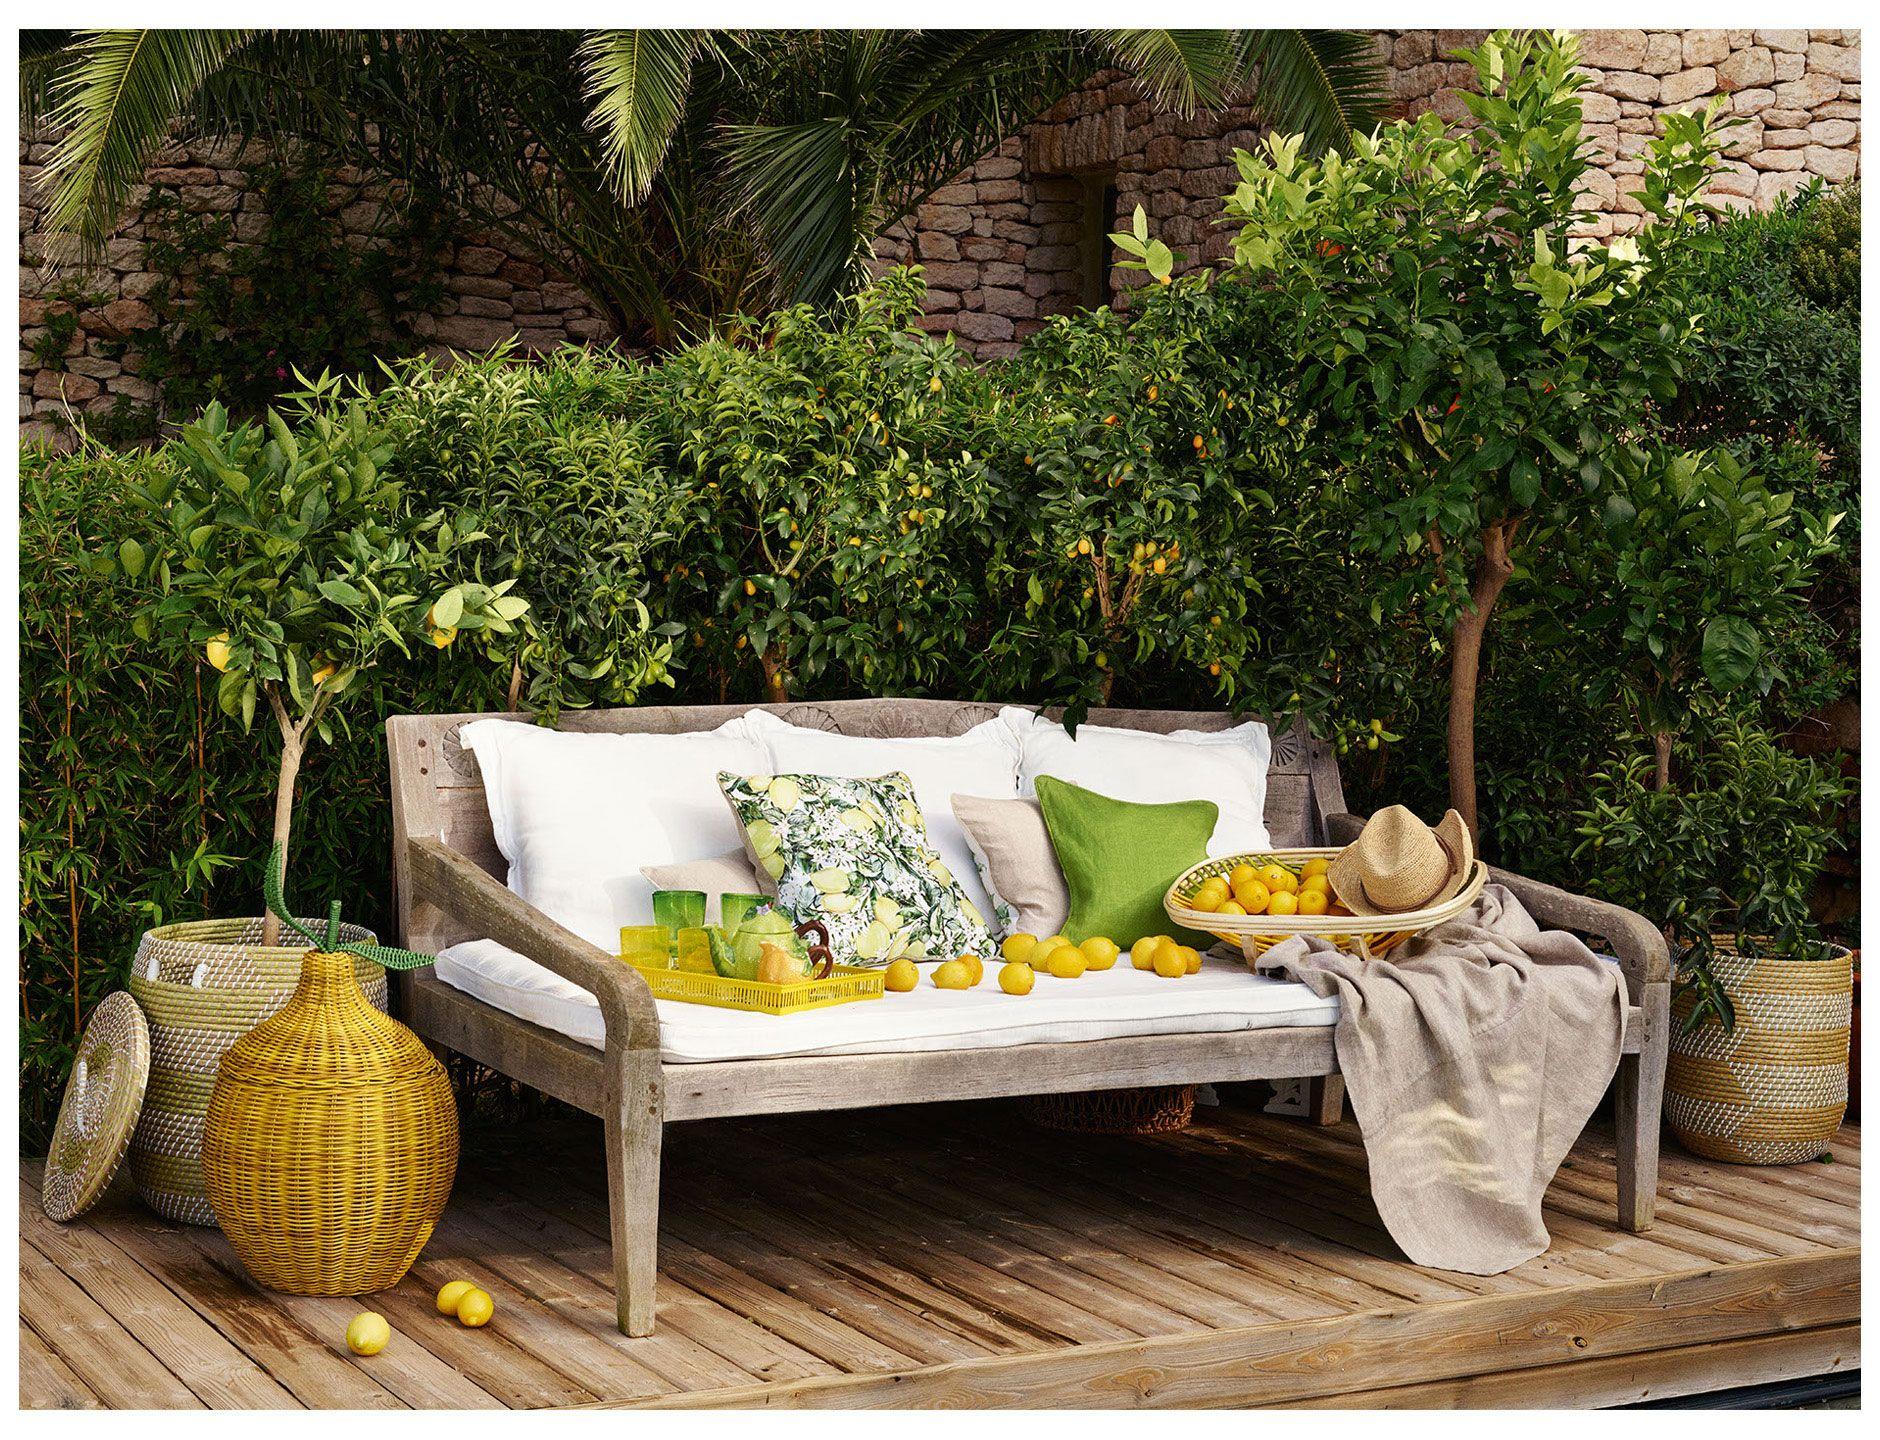 LookBook  Zara home, Outdoor furniture sets, Outdoor sectional sofa